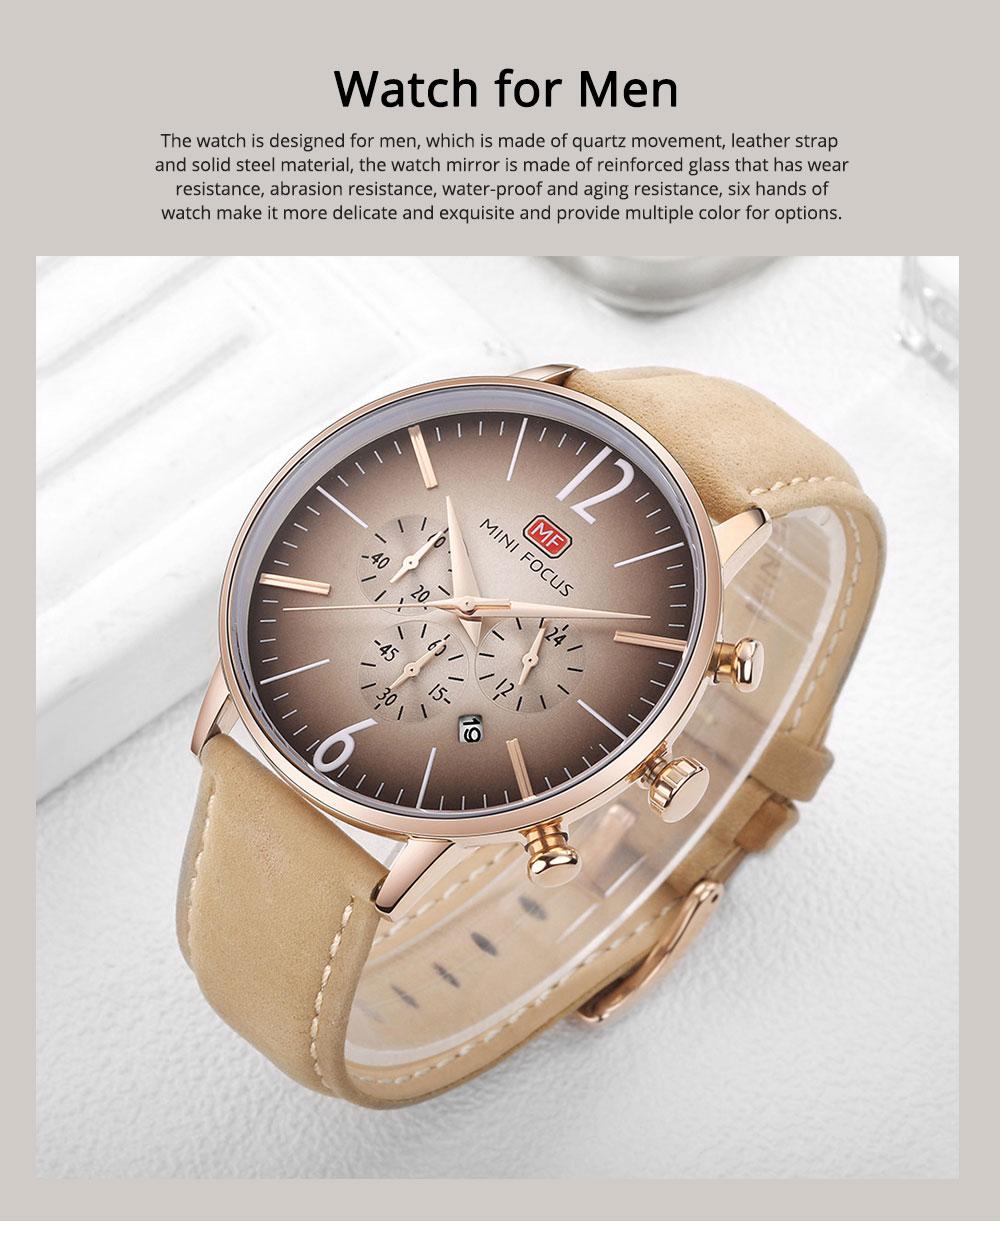 Fashionable Leather Strap Watch for Men Water-proof Round Dial Watch Minimalist Quartz Wrist Watch 0